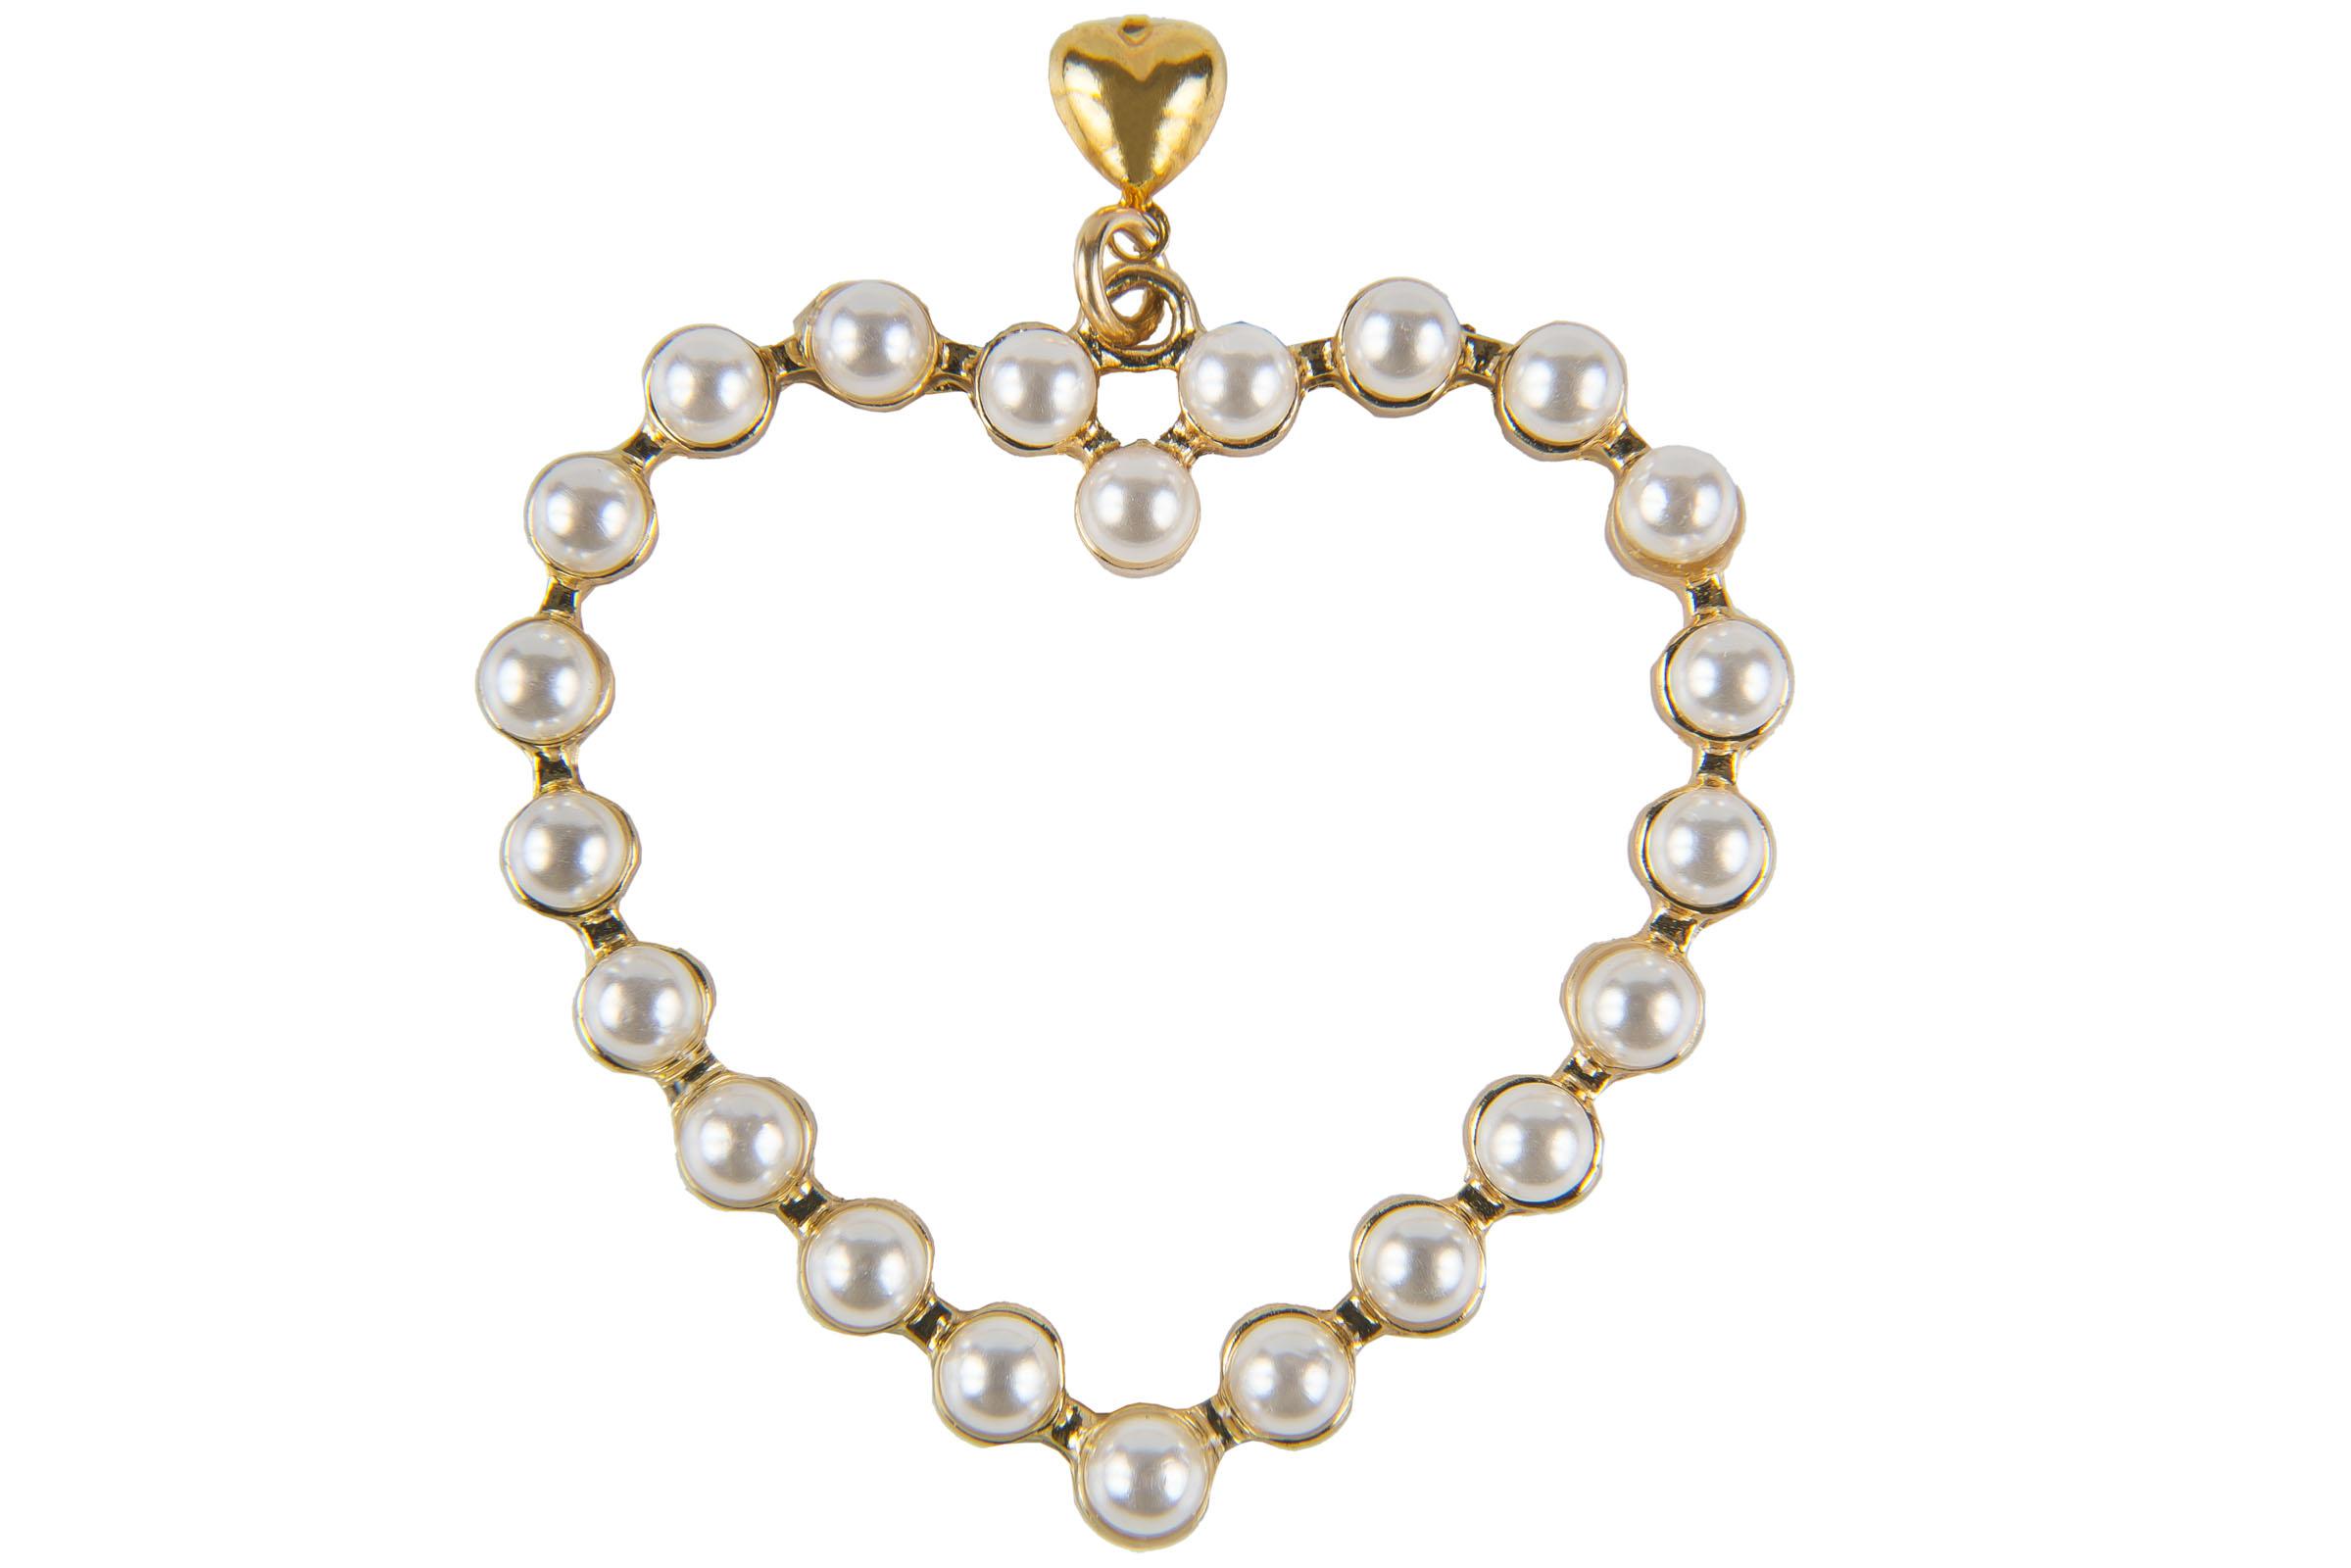 Yunis K earrings